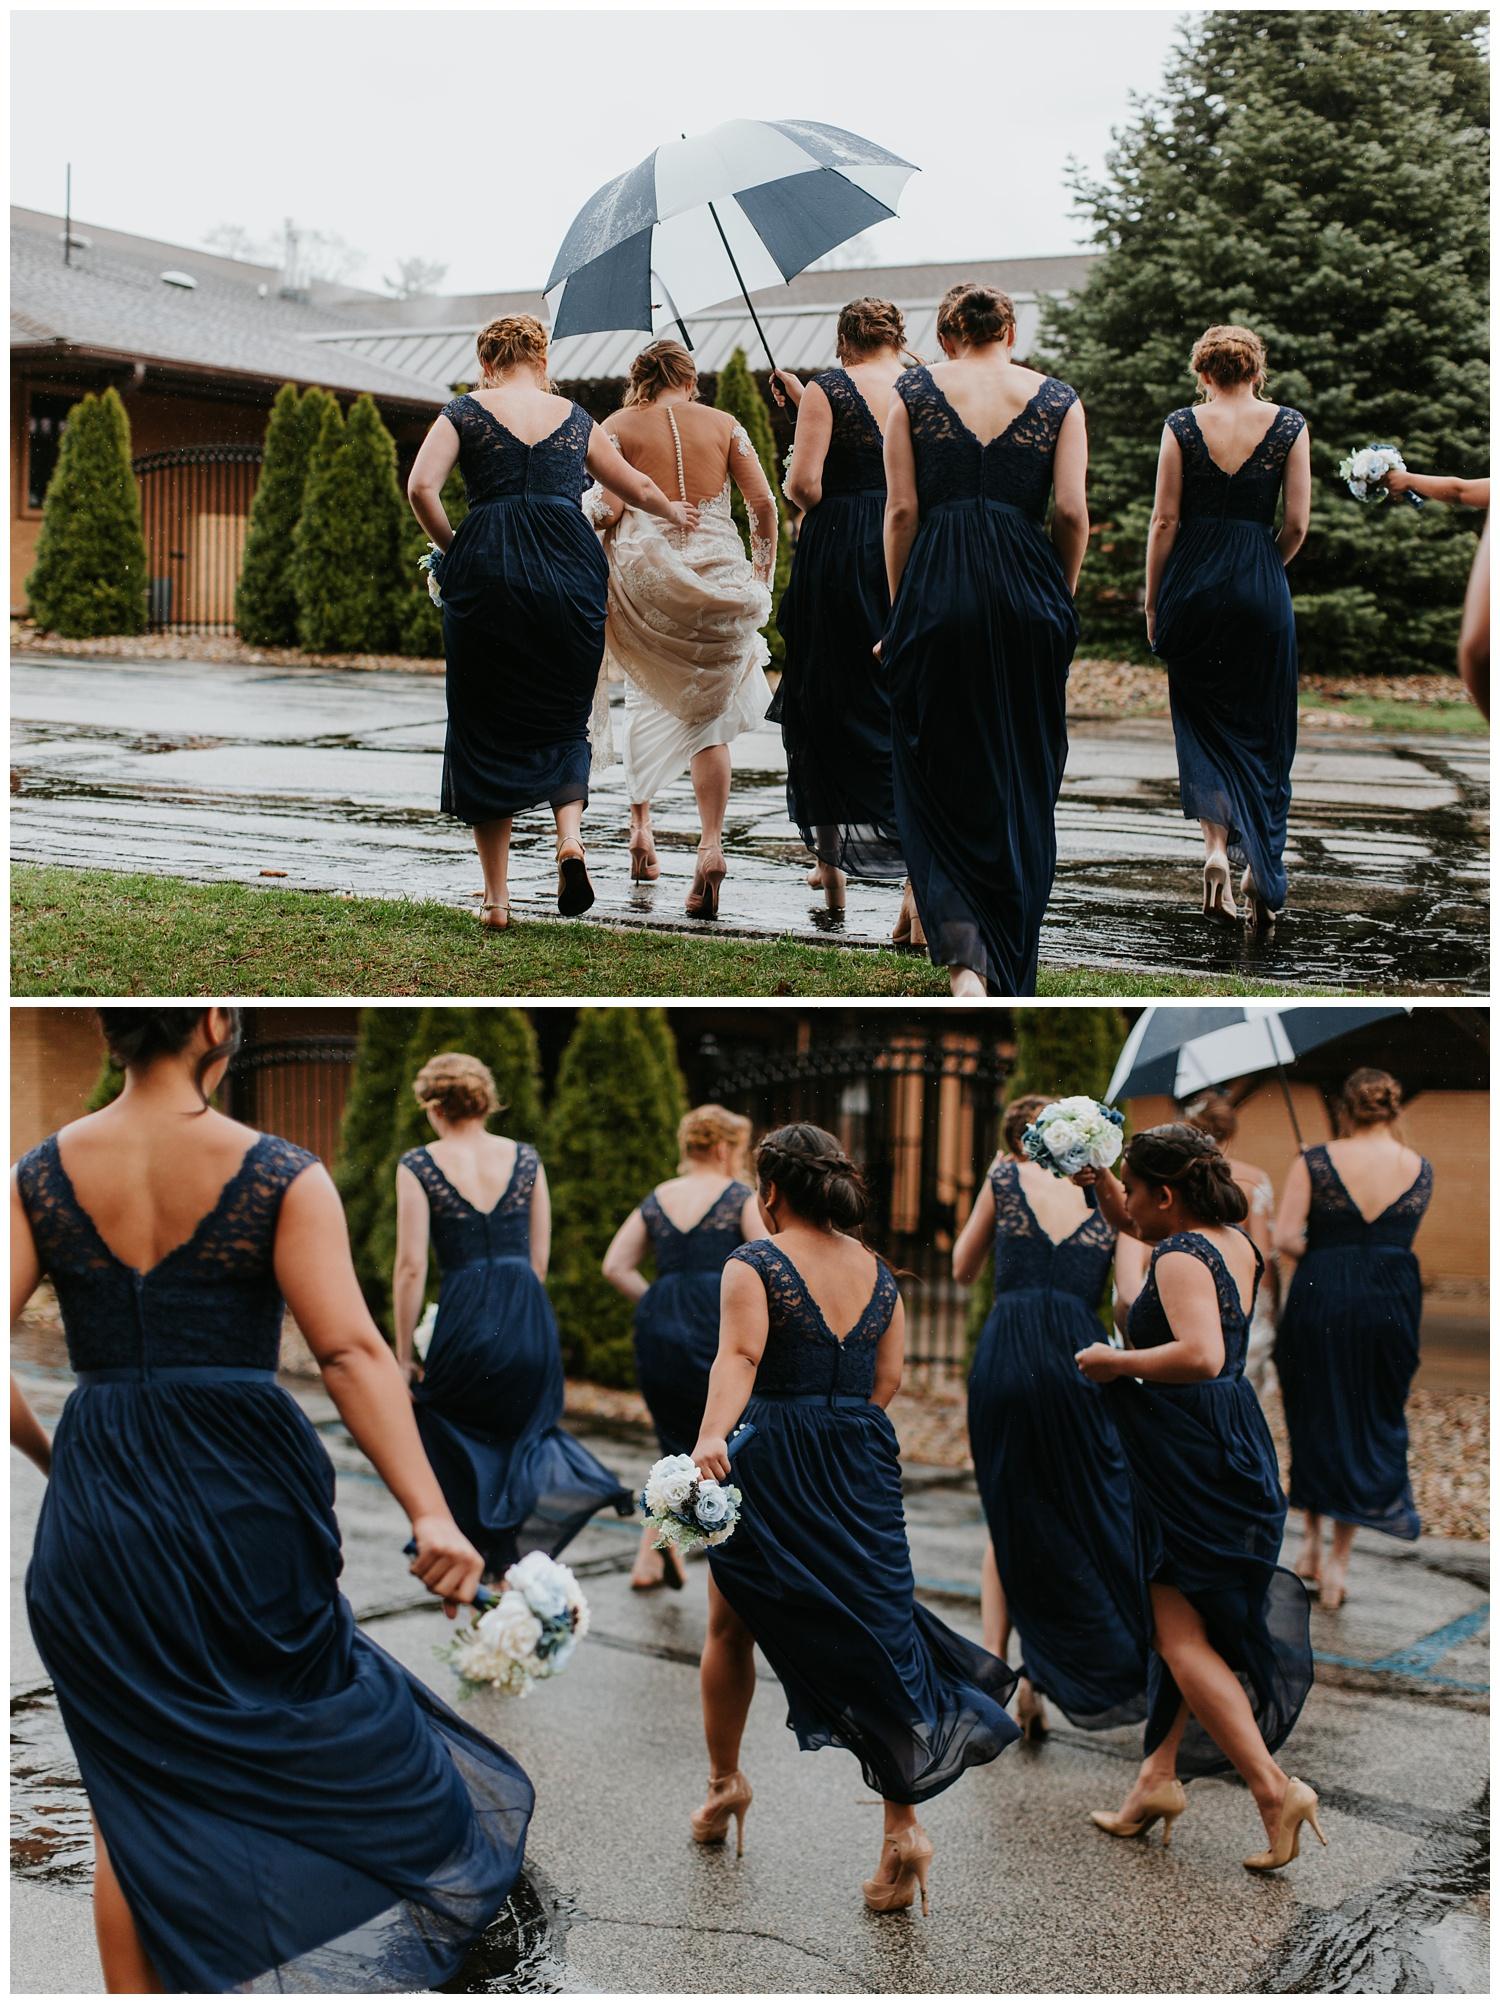 Shadowland Silver Beach St. Joseph Wedding Photographer Rainy Wedding20.jpg